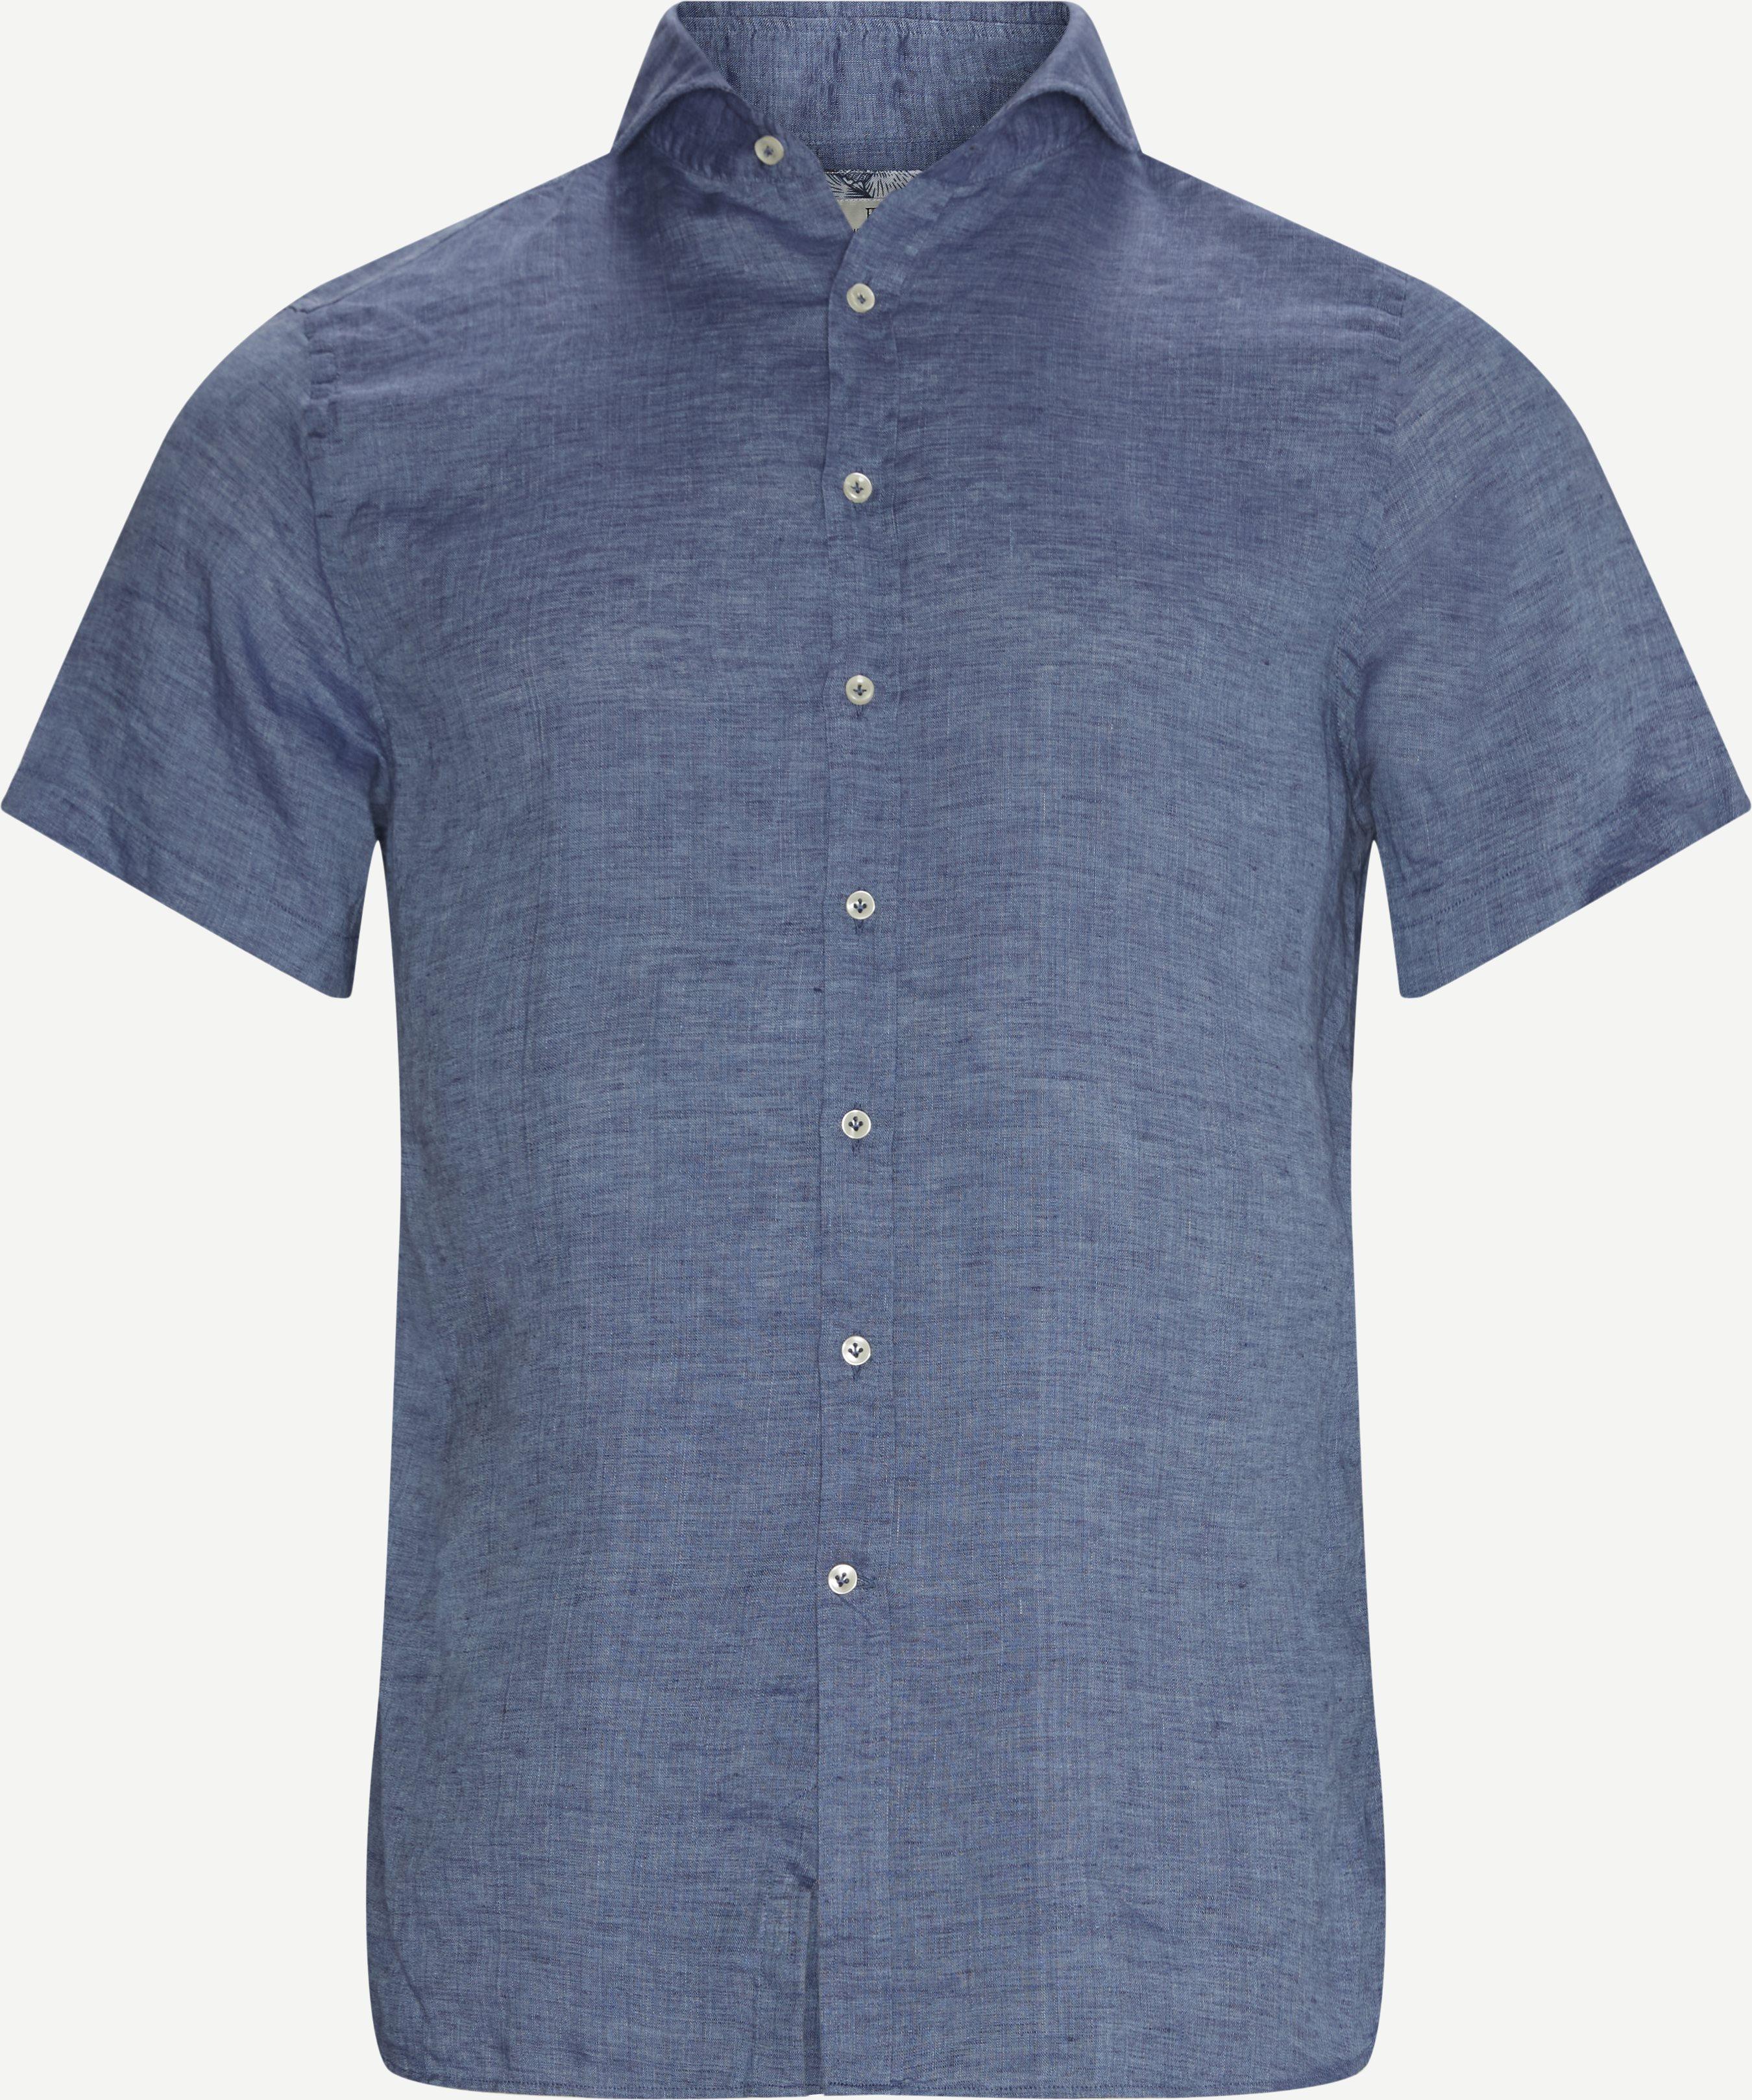 Einfarbige hemden - Regular - Blau